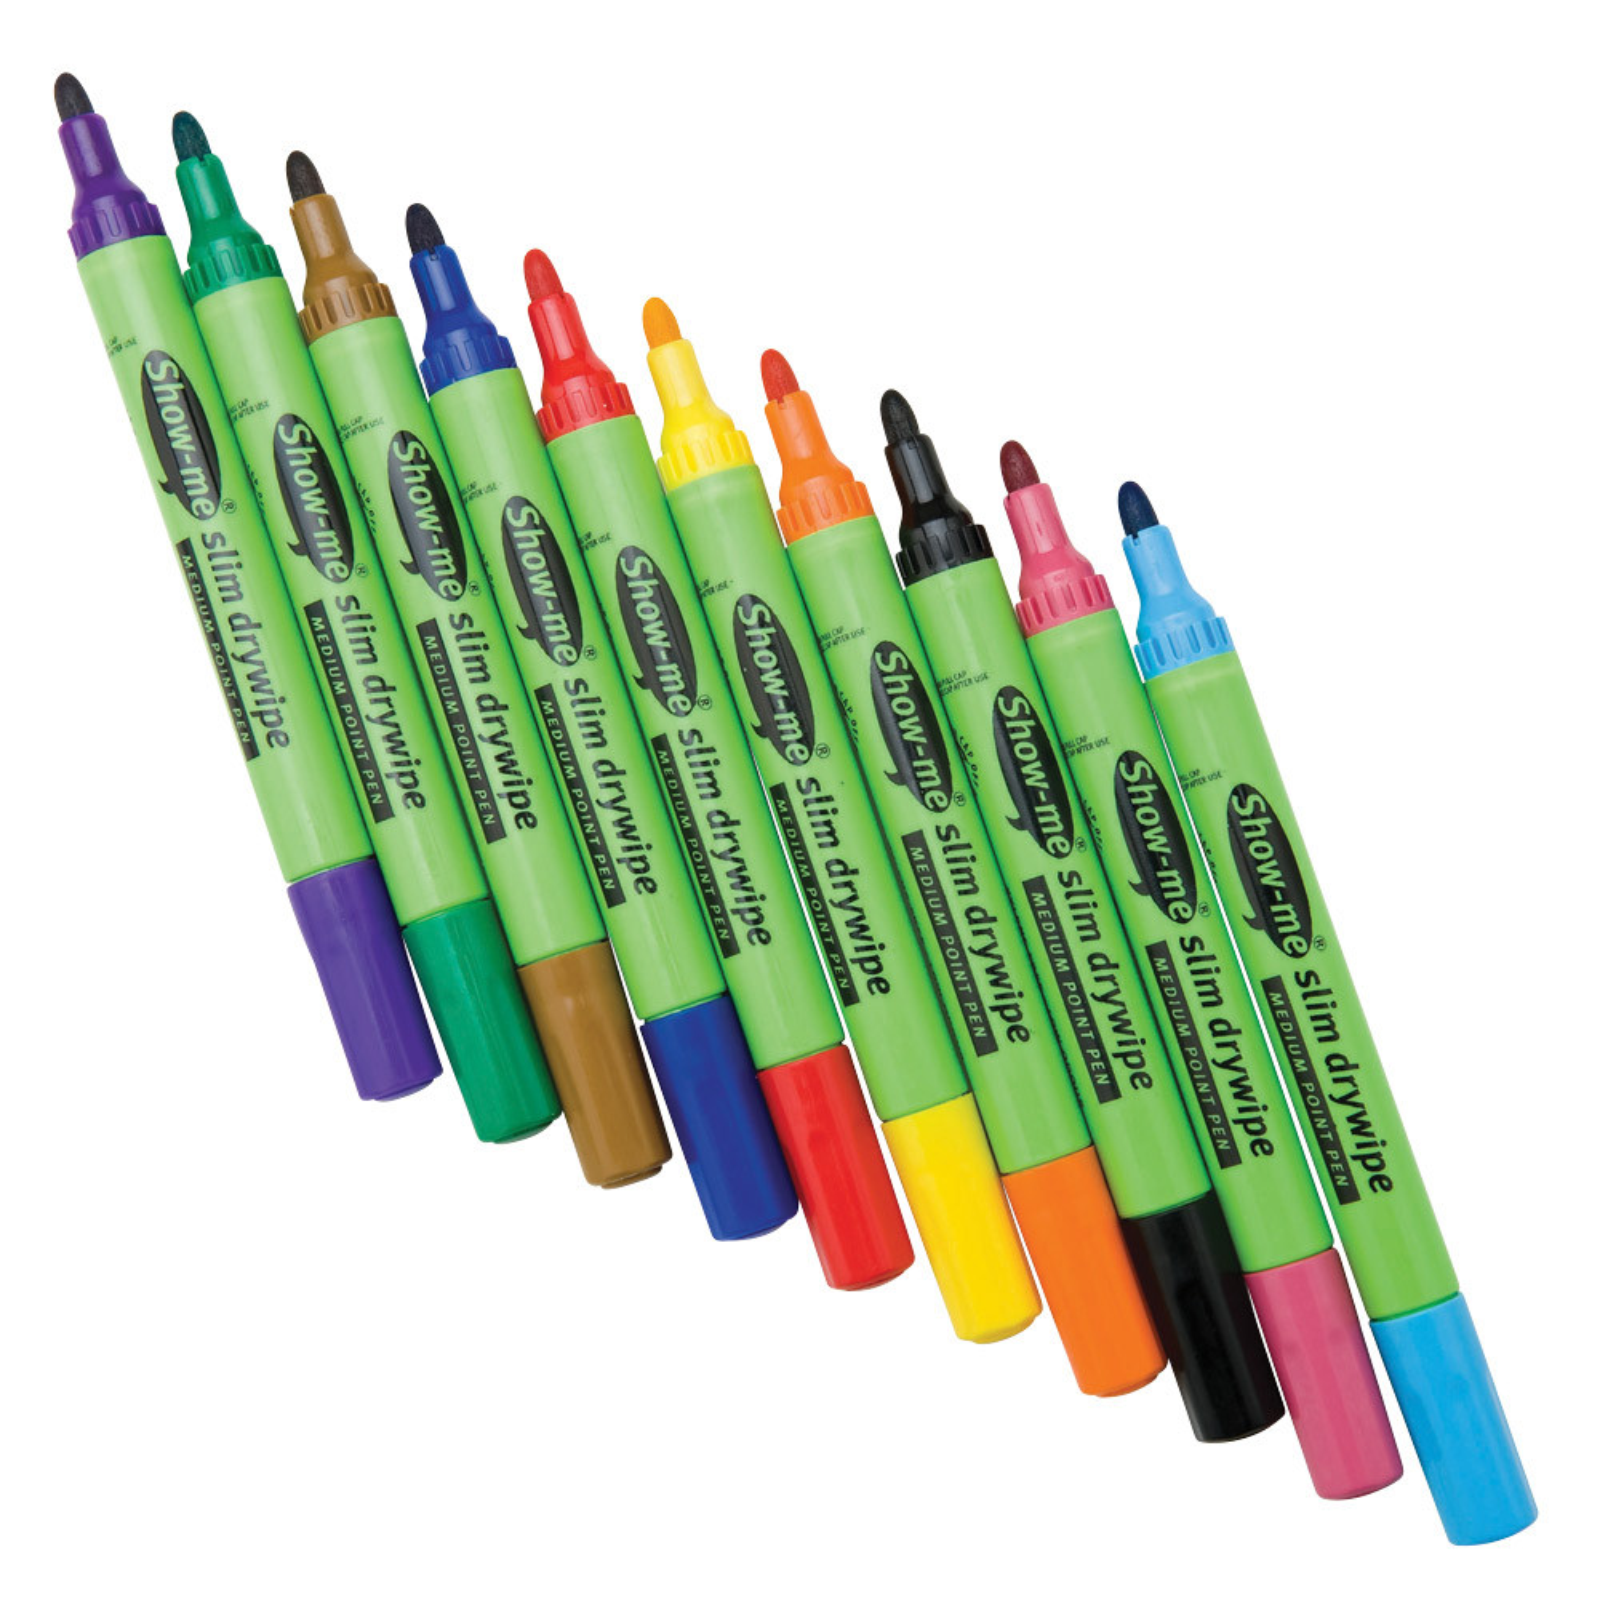 Show-me Medium Point Slim Barrel Drywipe Marker Wipeboard Black Pens